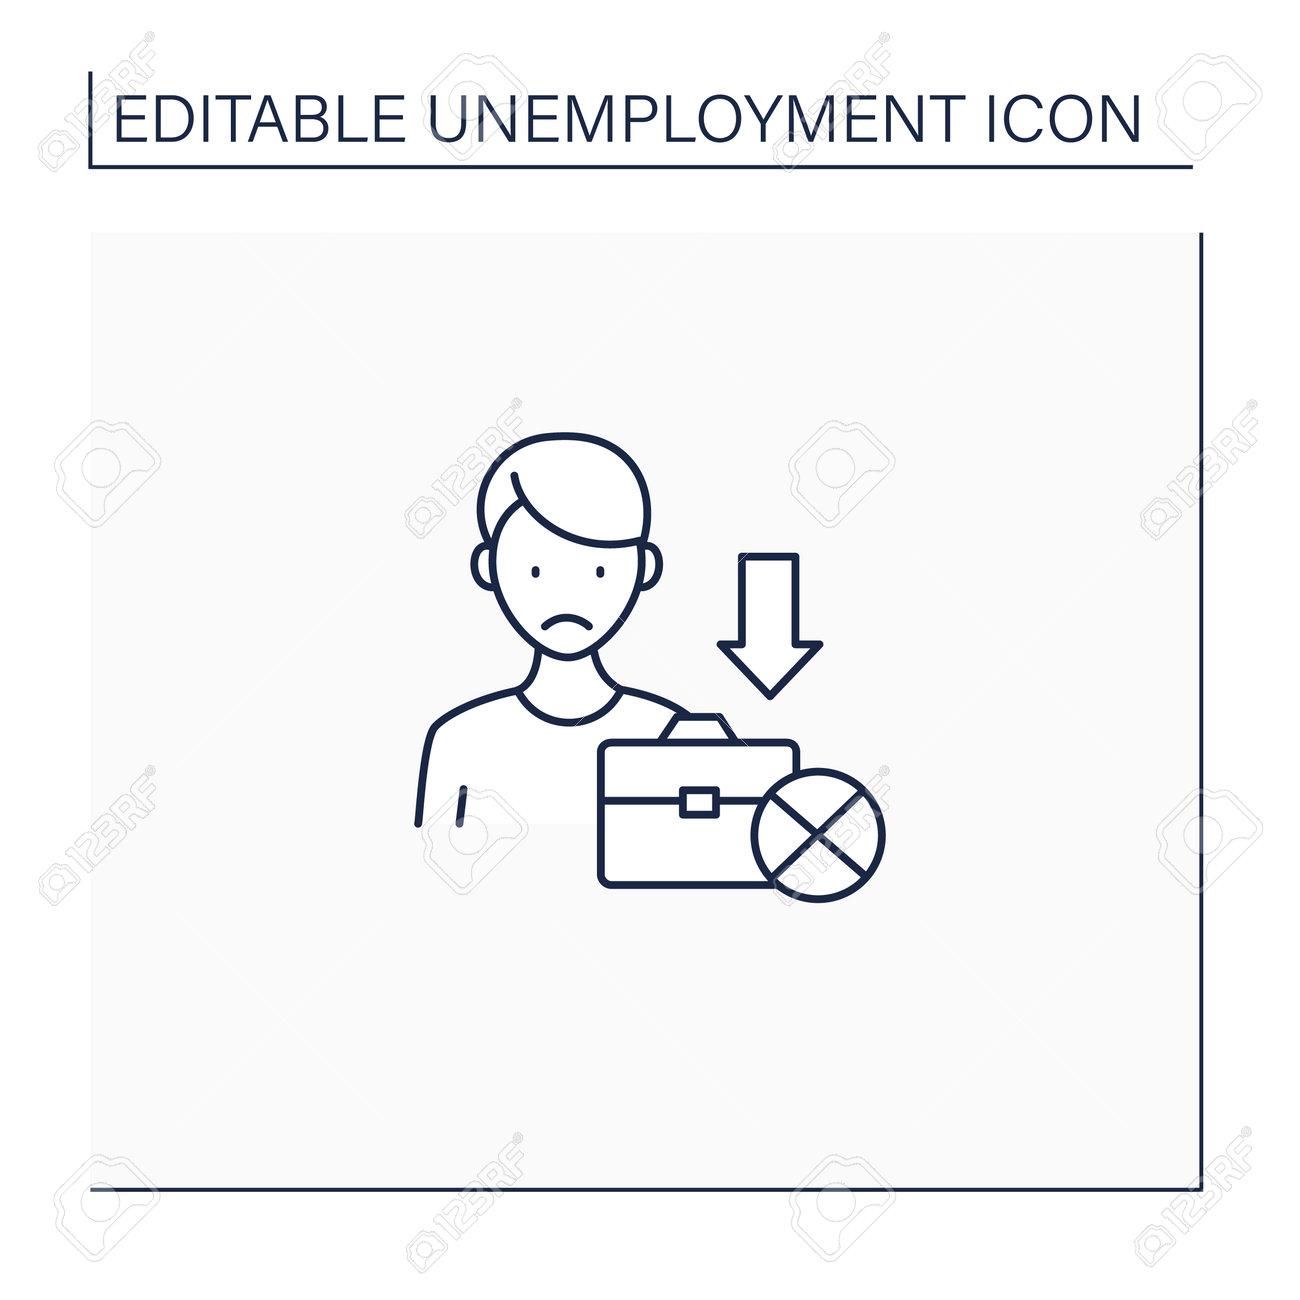 Jobless line icon - 172849694